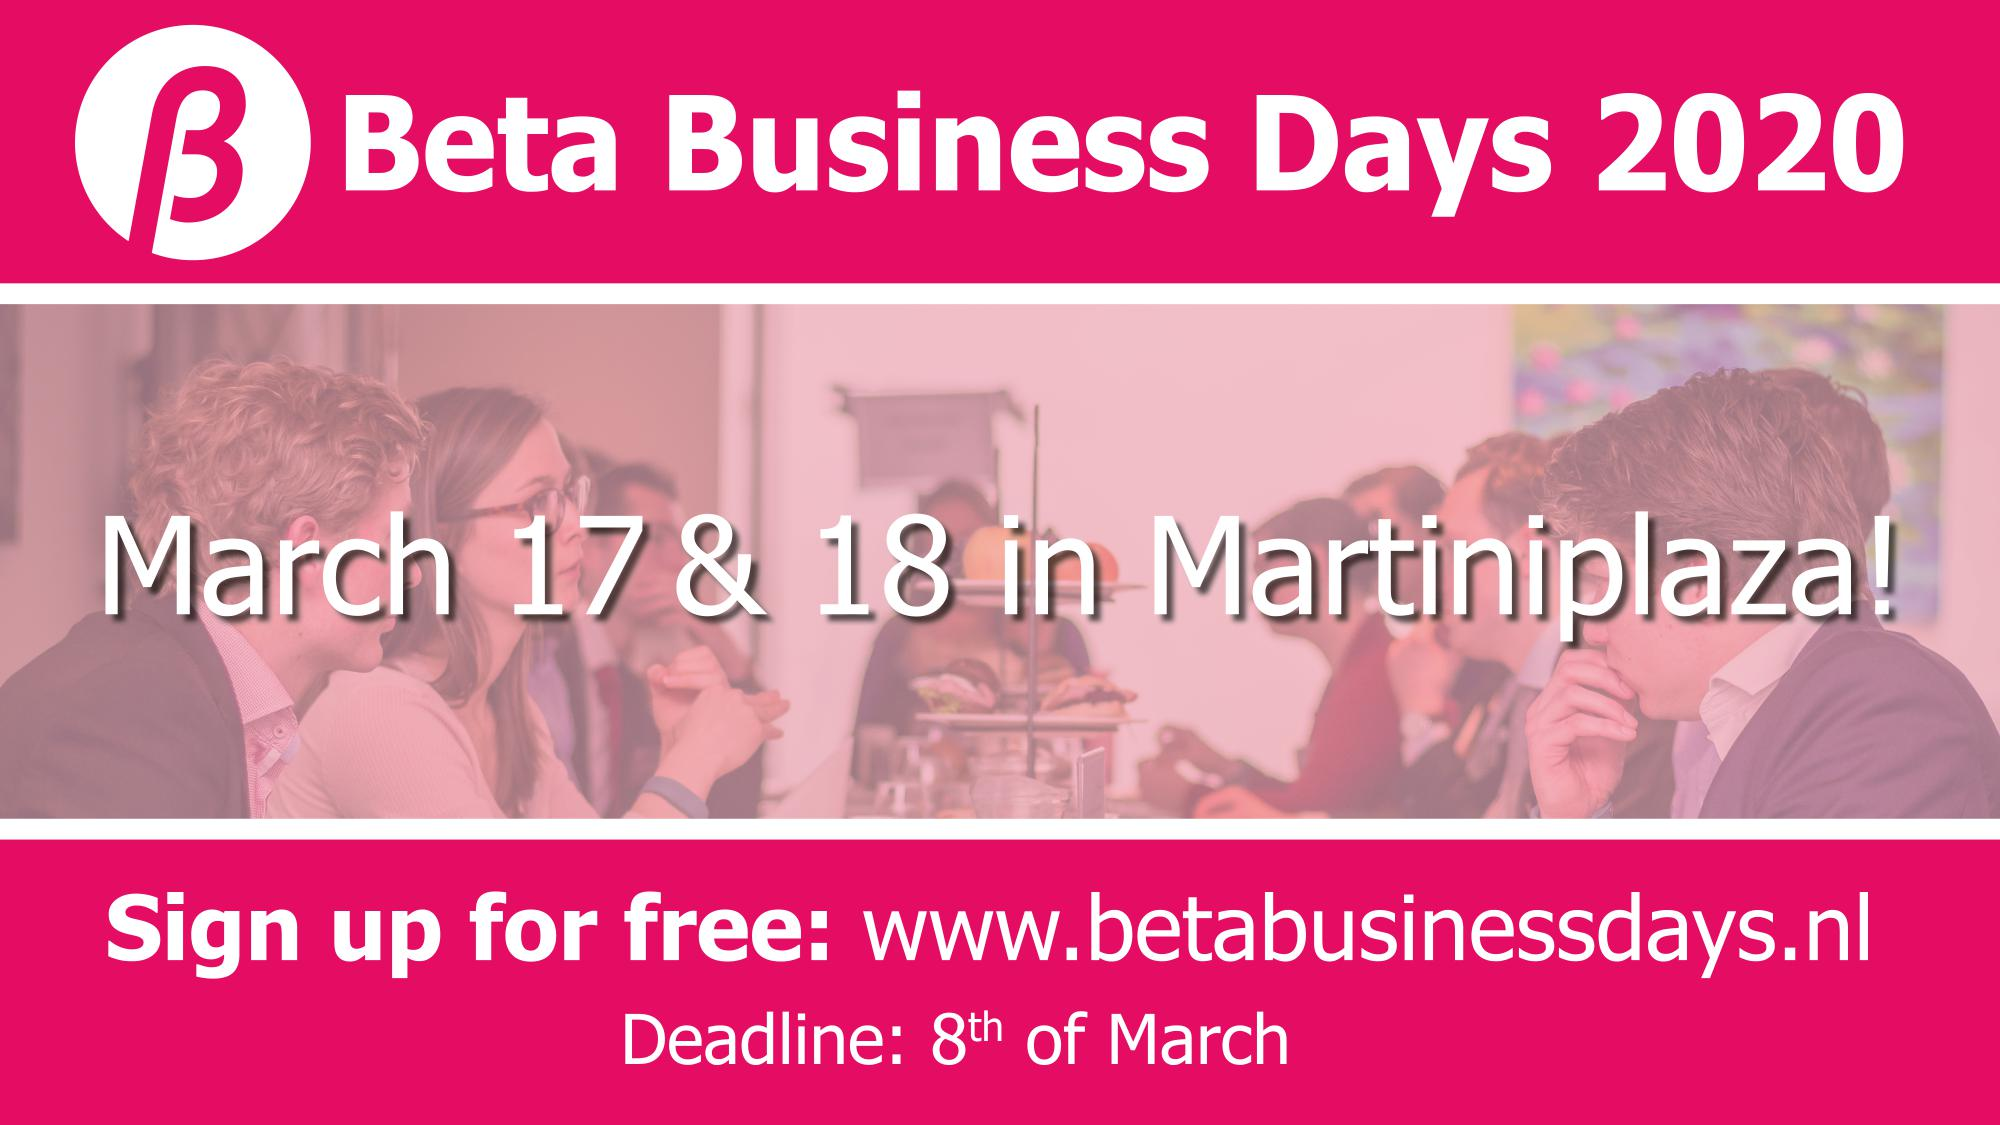 Beta Business Days